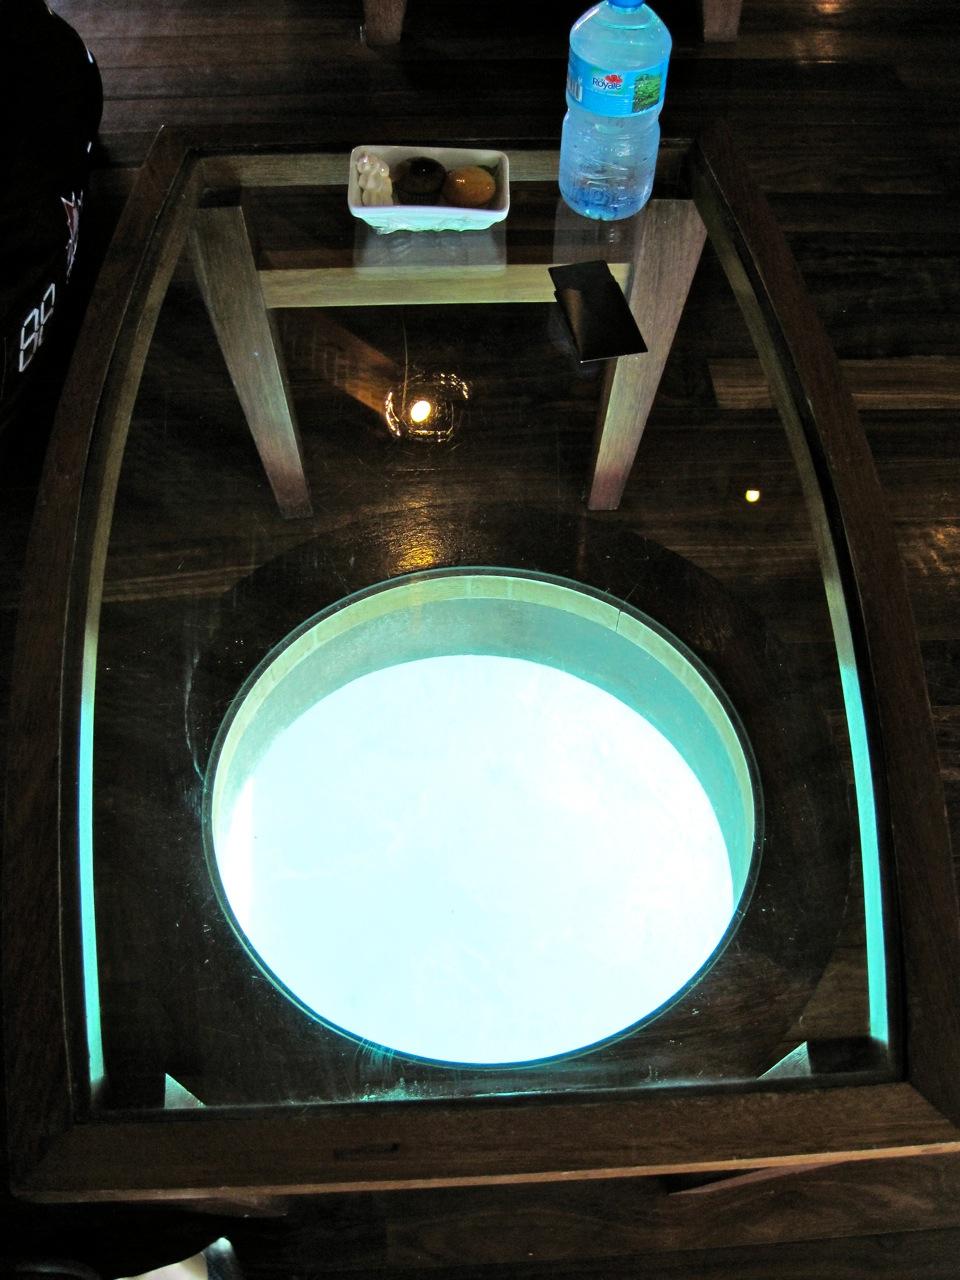 glasstop table at the overwater bungalow Sofitel Bora Bora Private Island